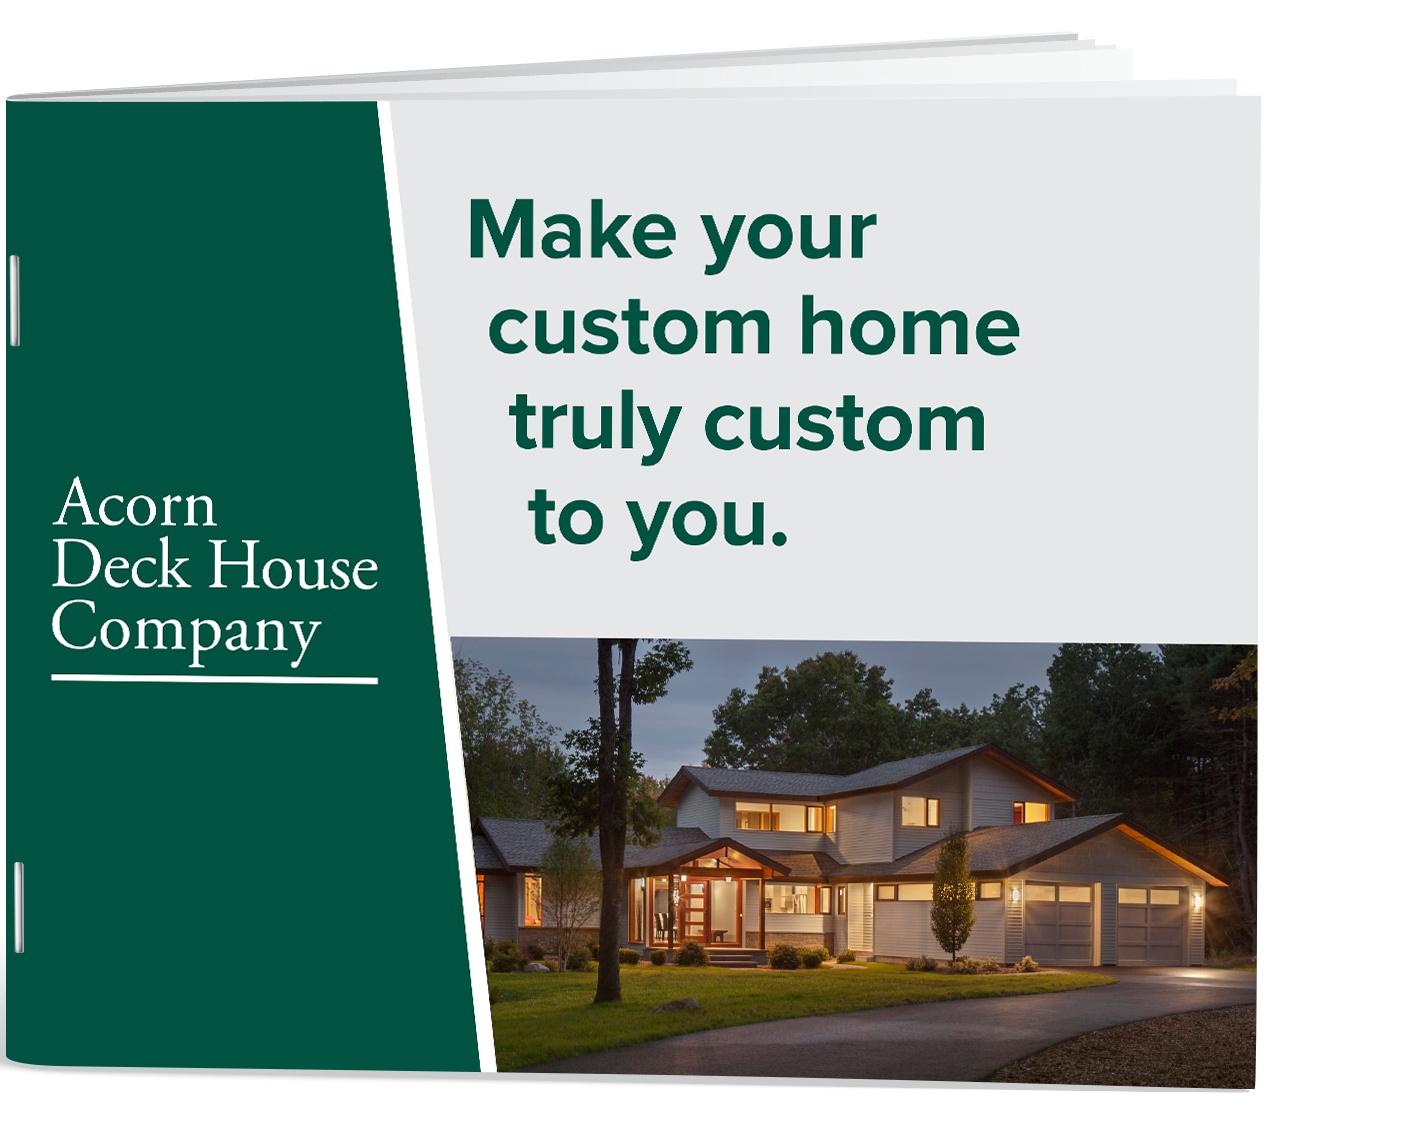 The Ultimate Custom Home Checklist